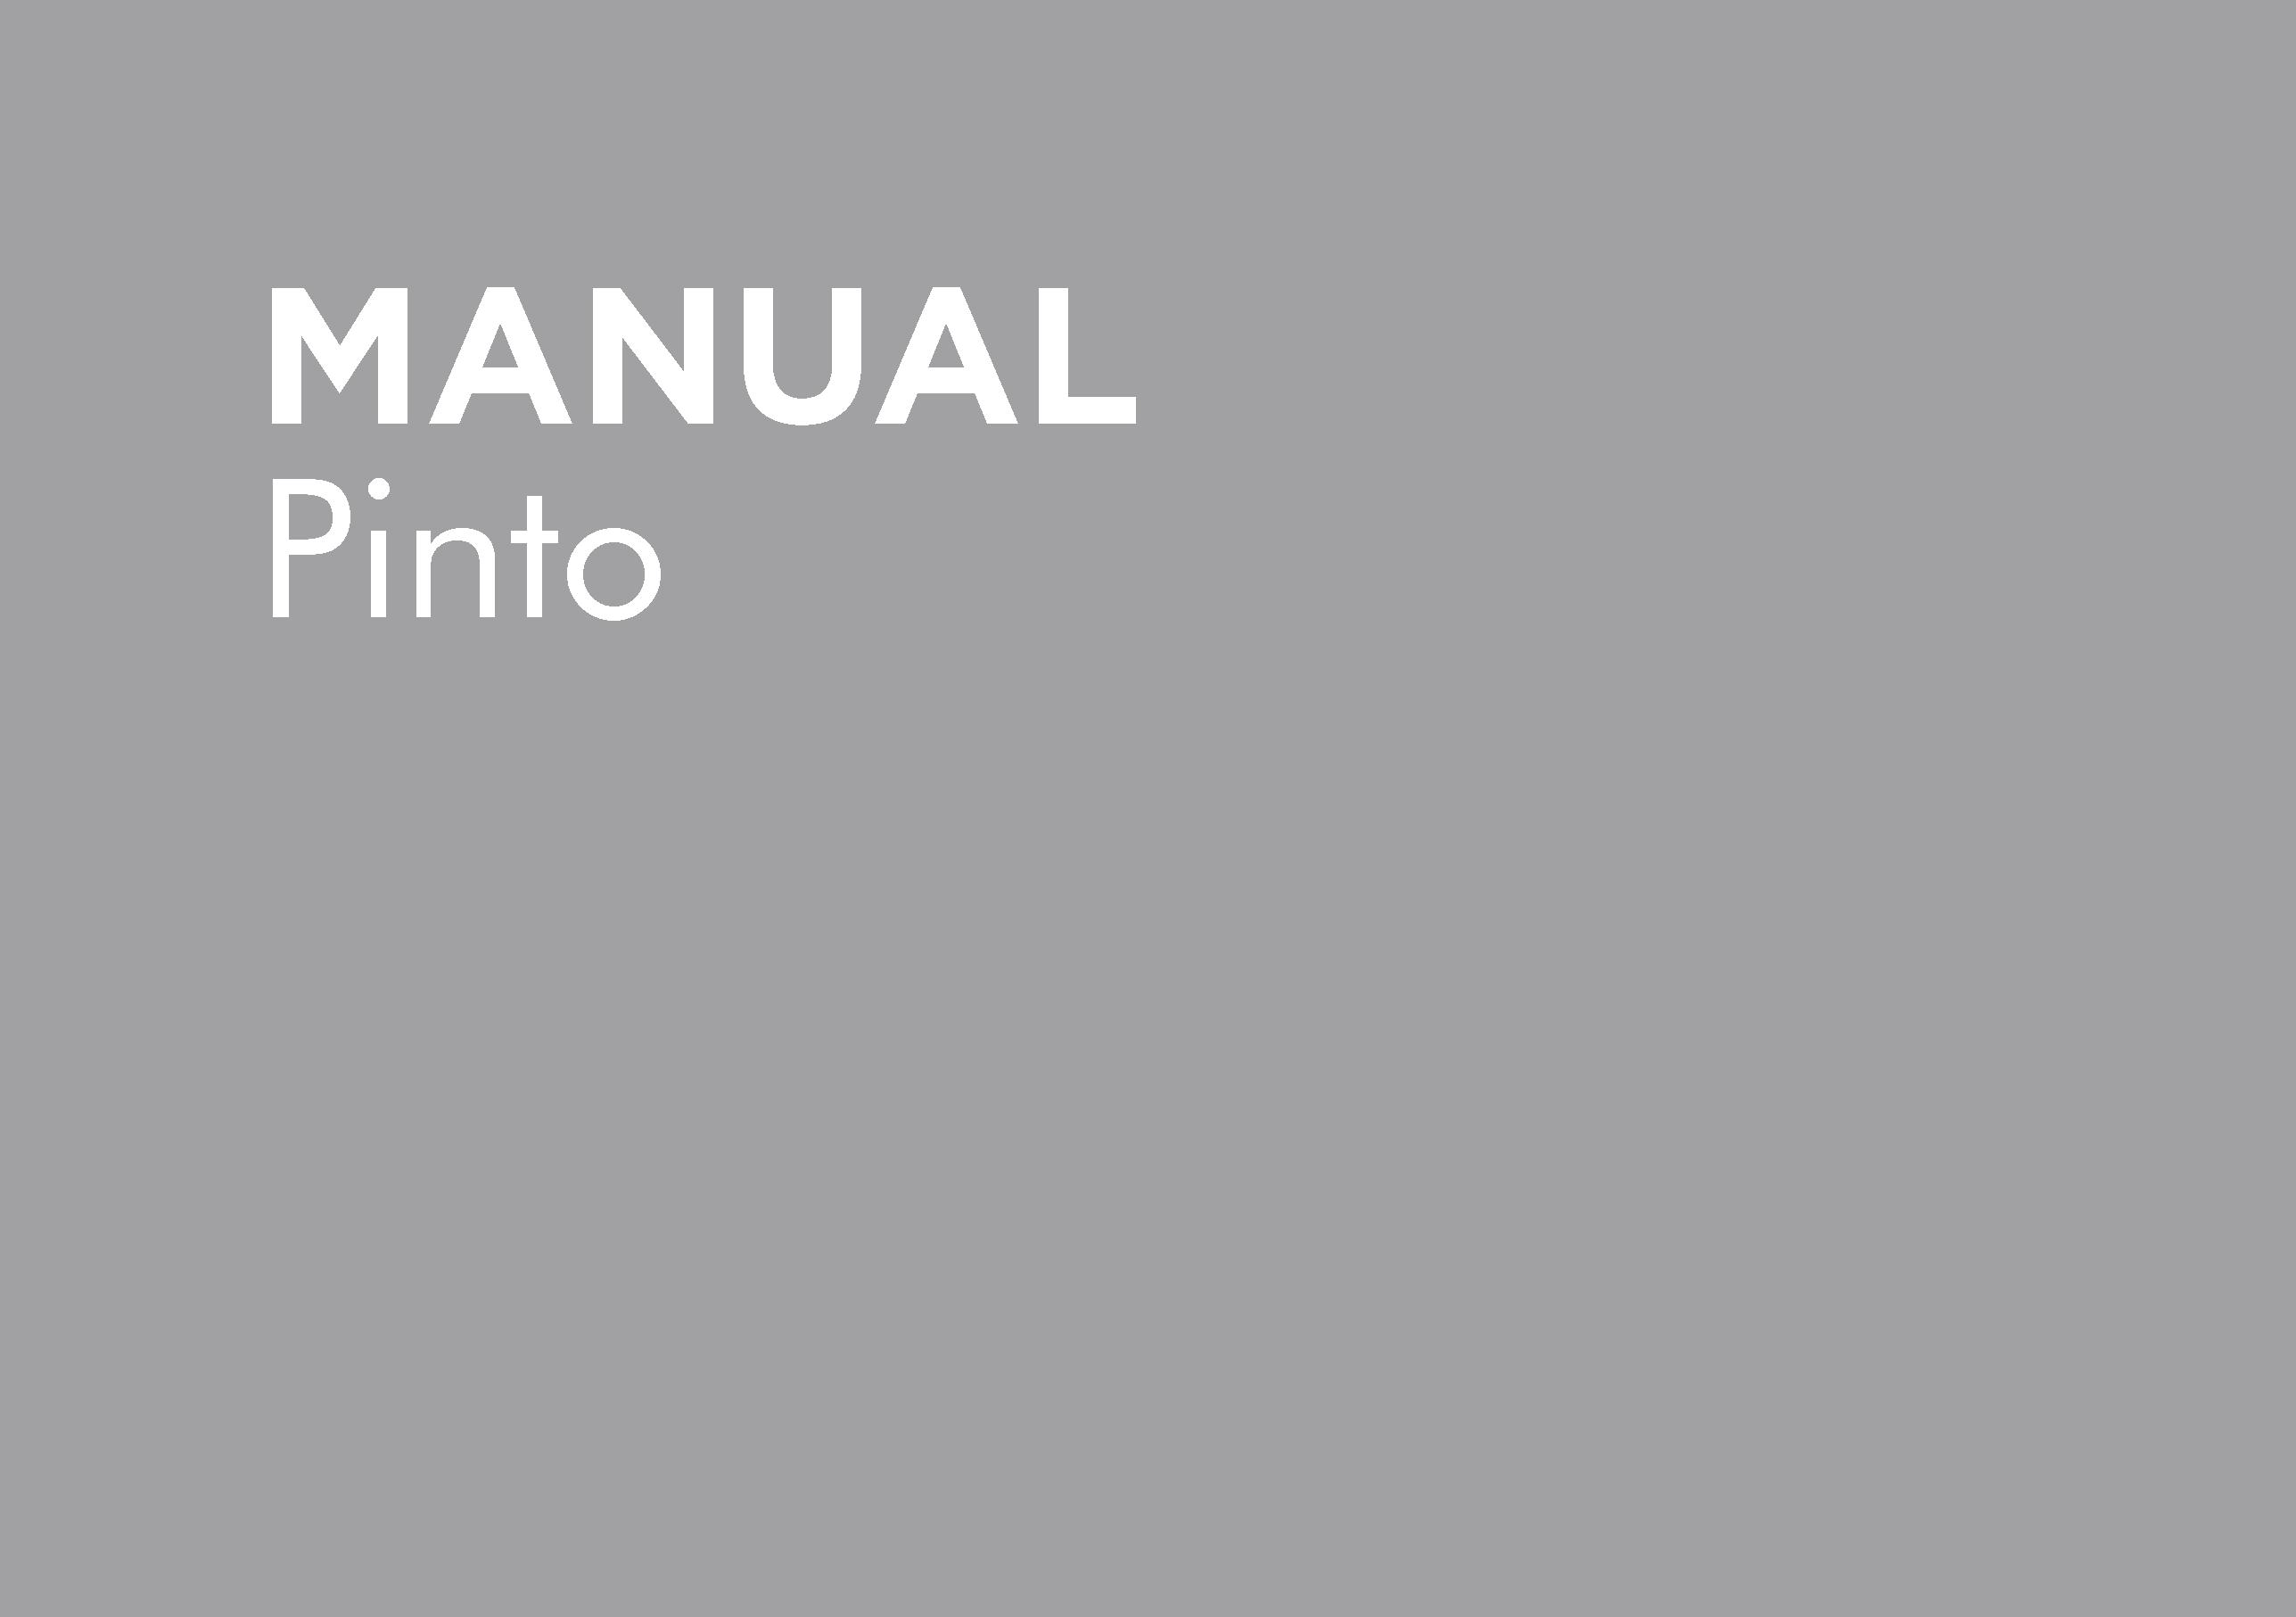 BT-POM00210 – PINTO V5B (1)